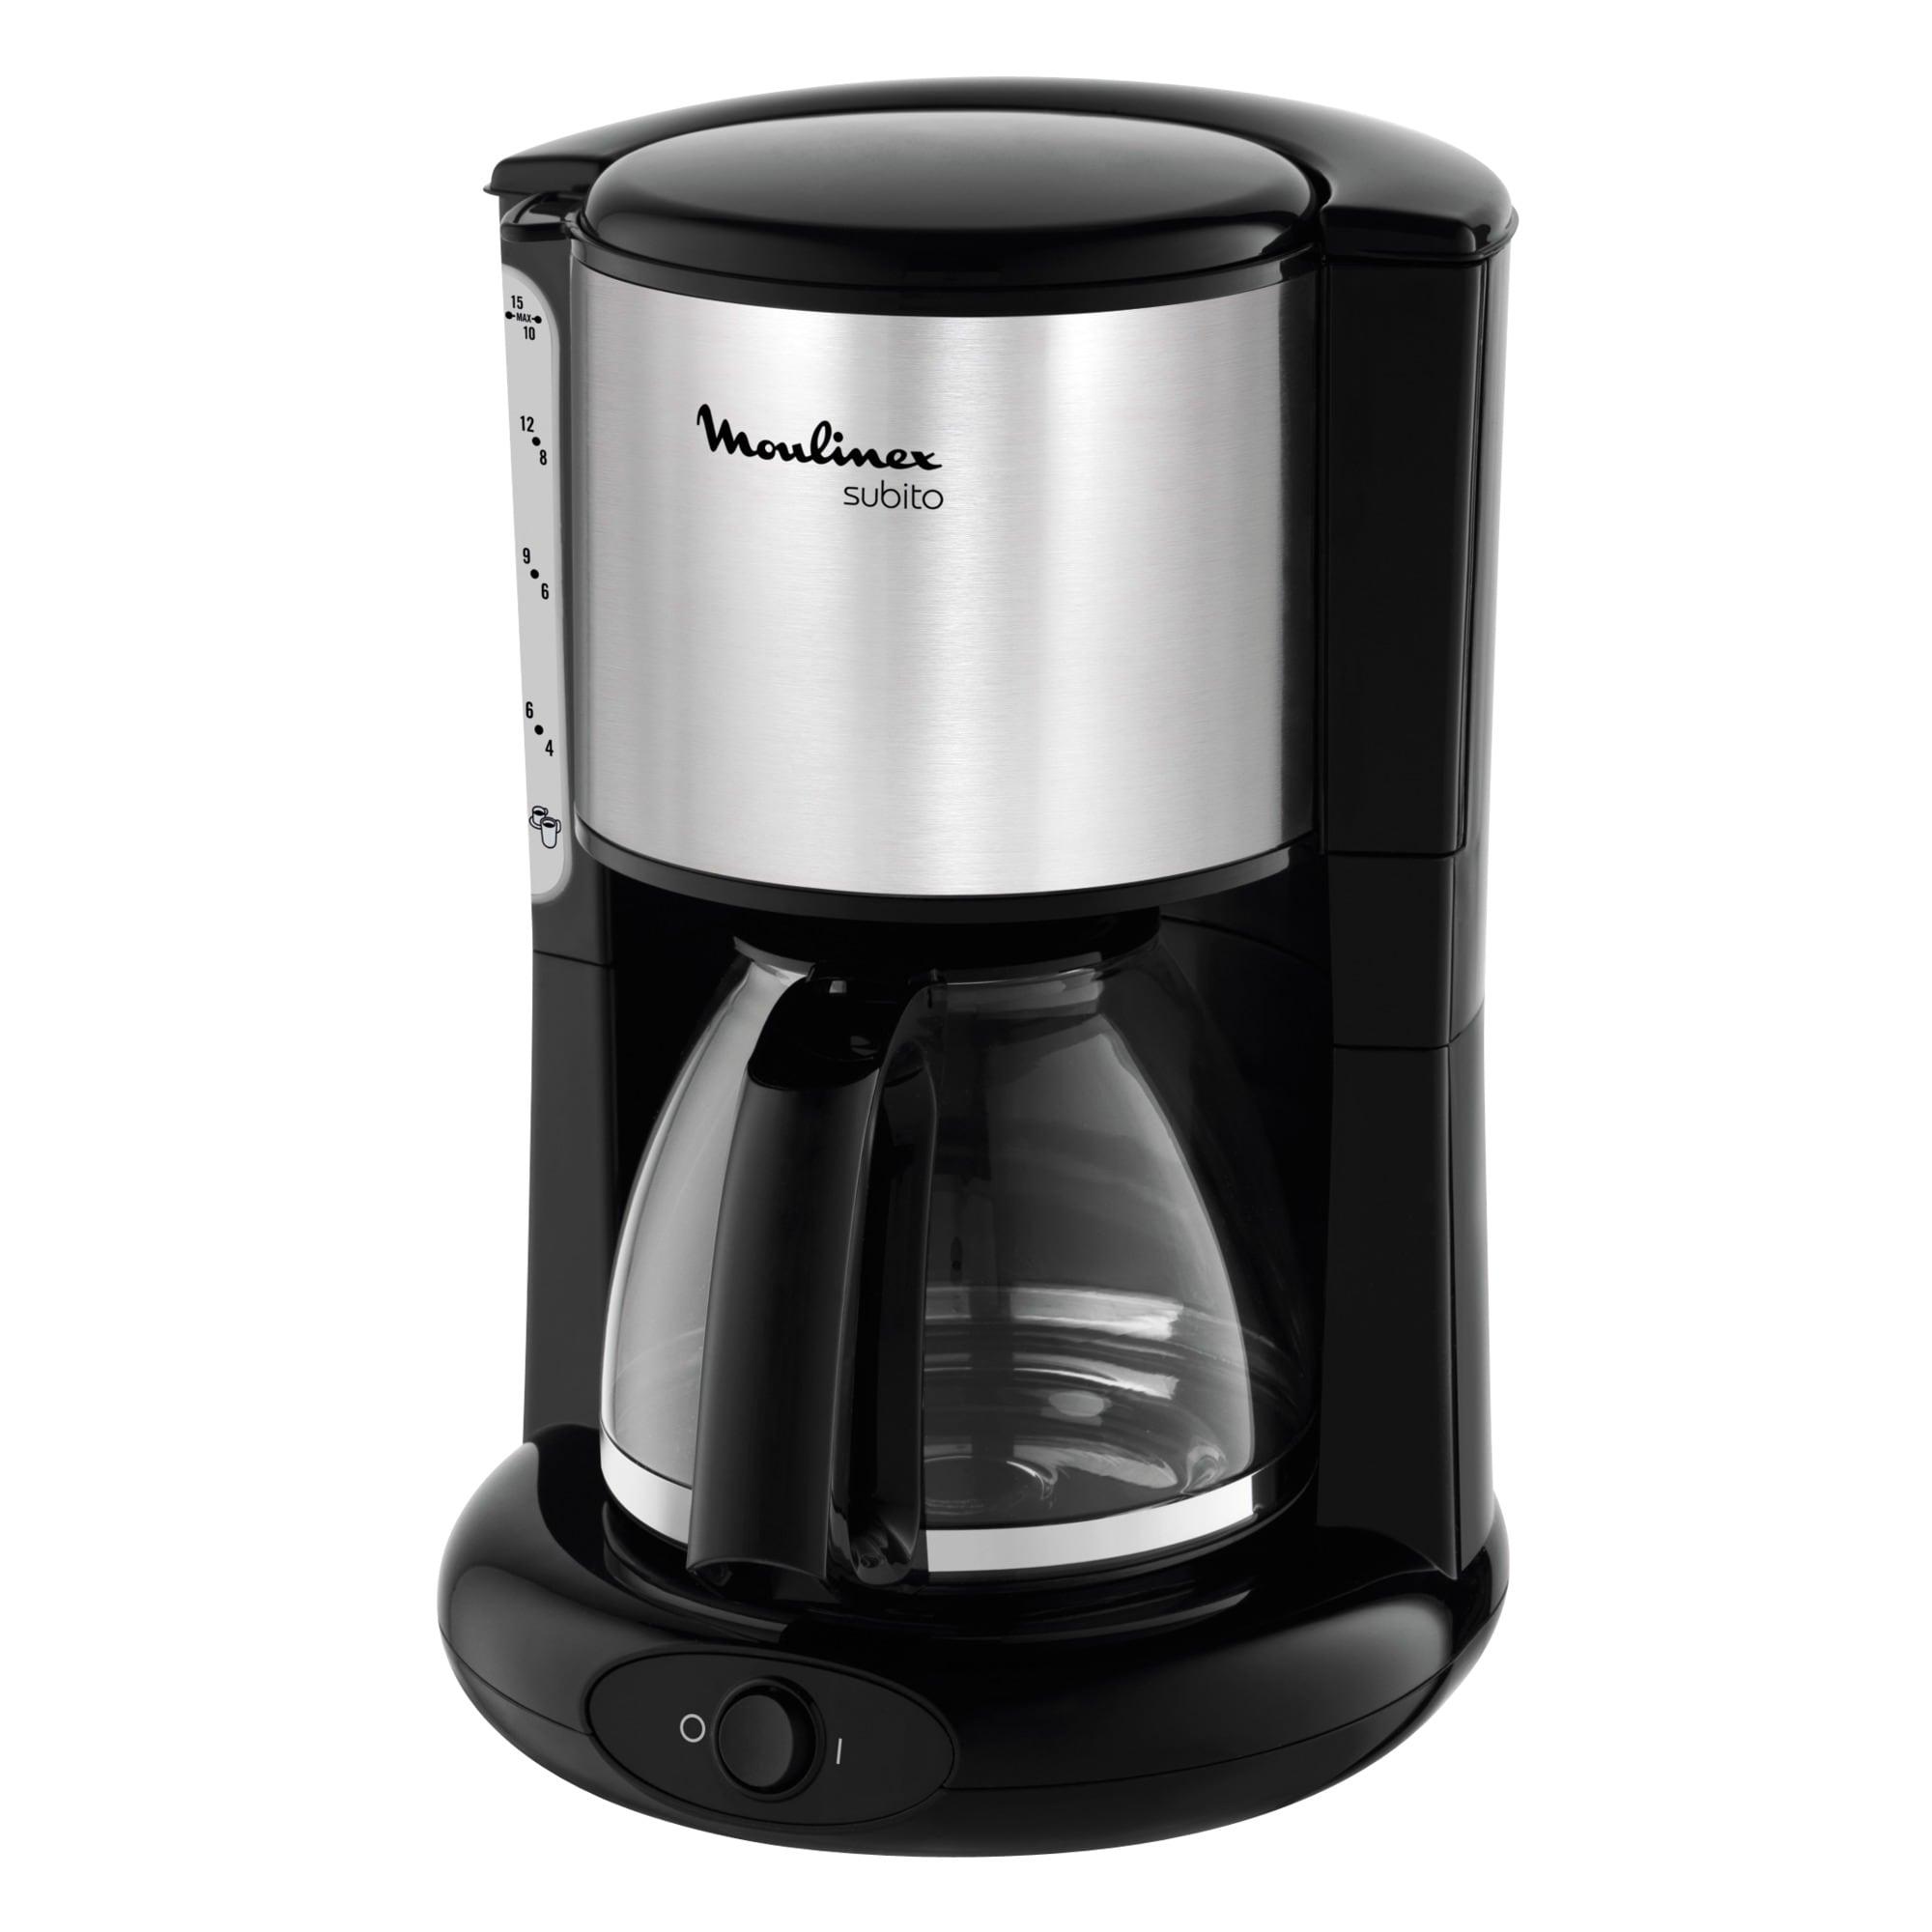 Moulinex Filtermaschine Subito FG3608